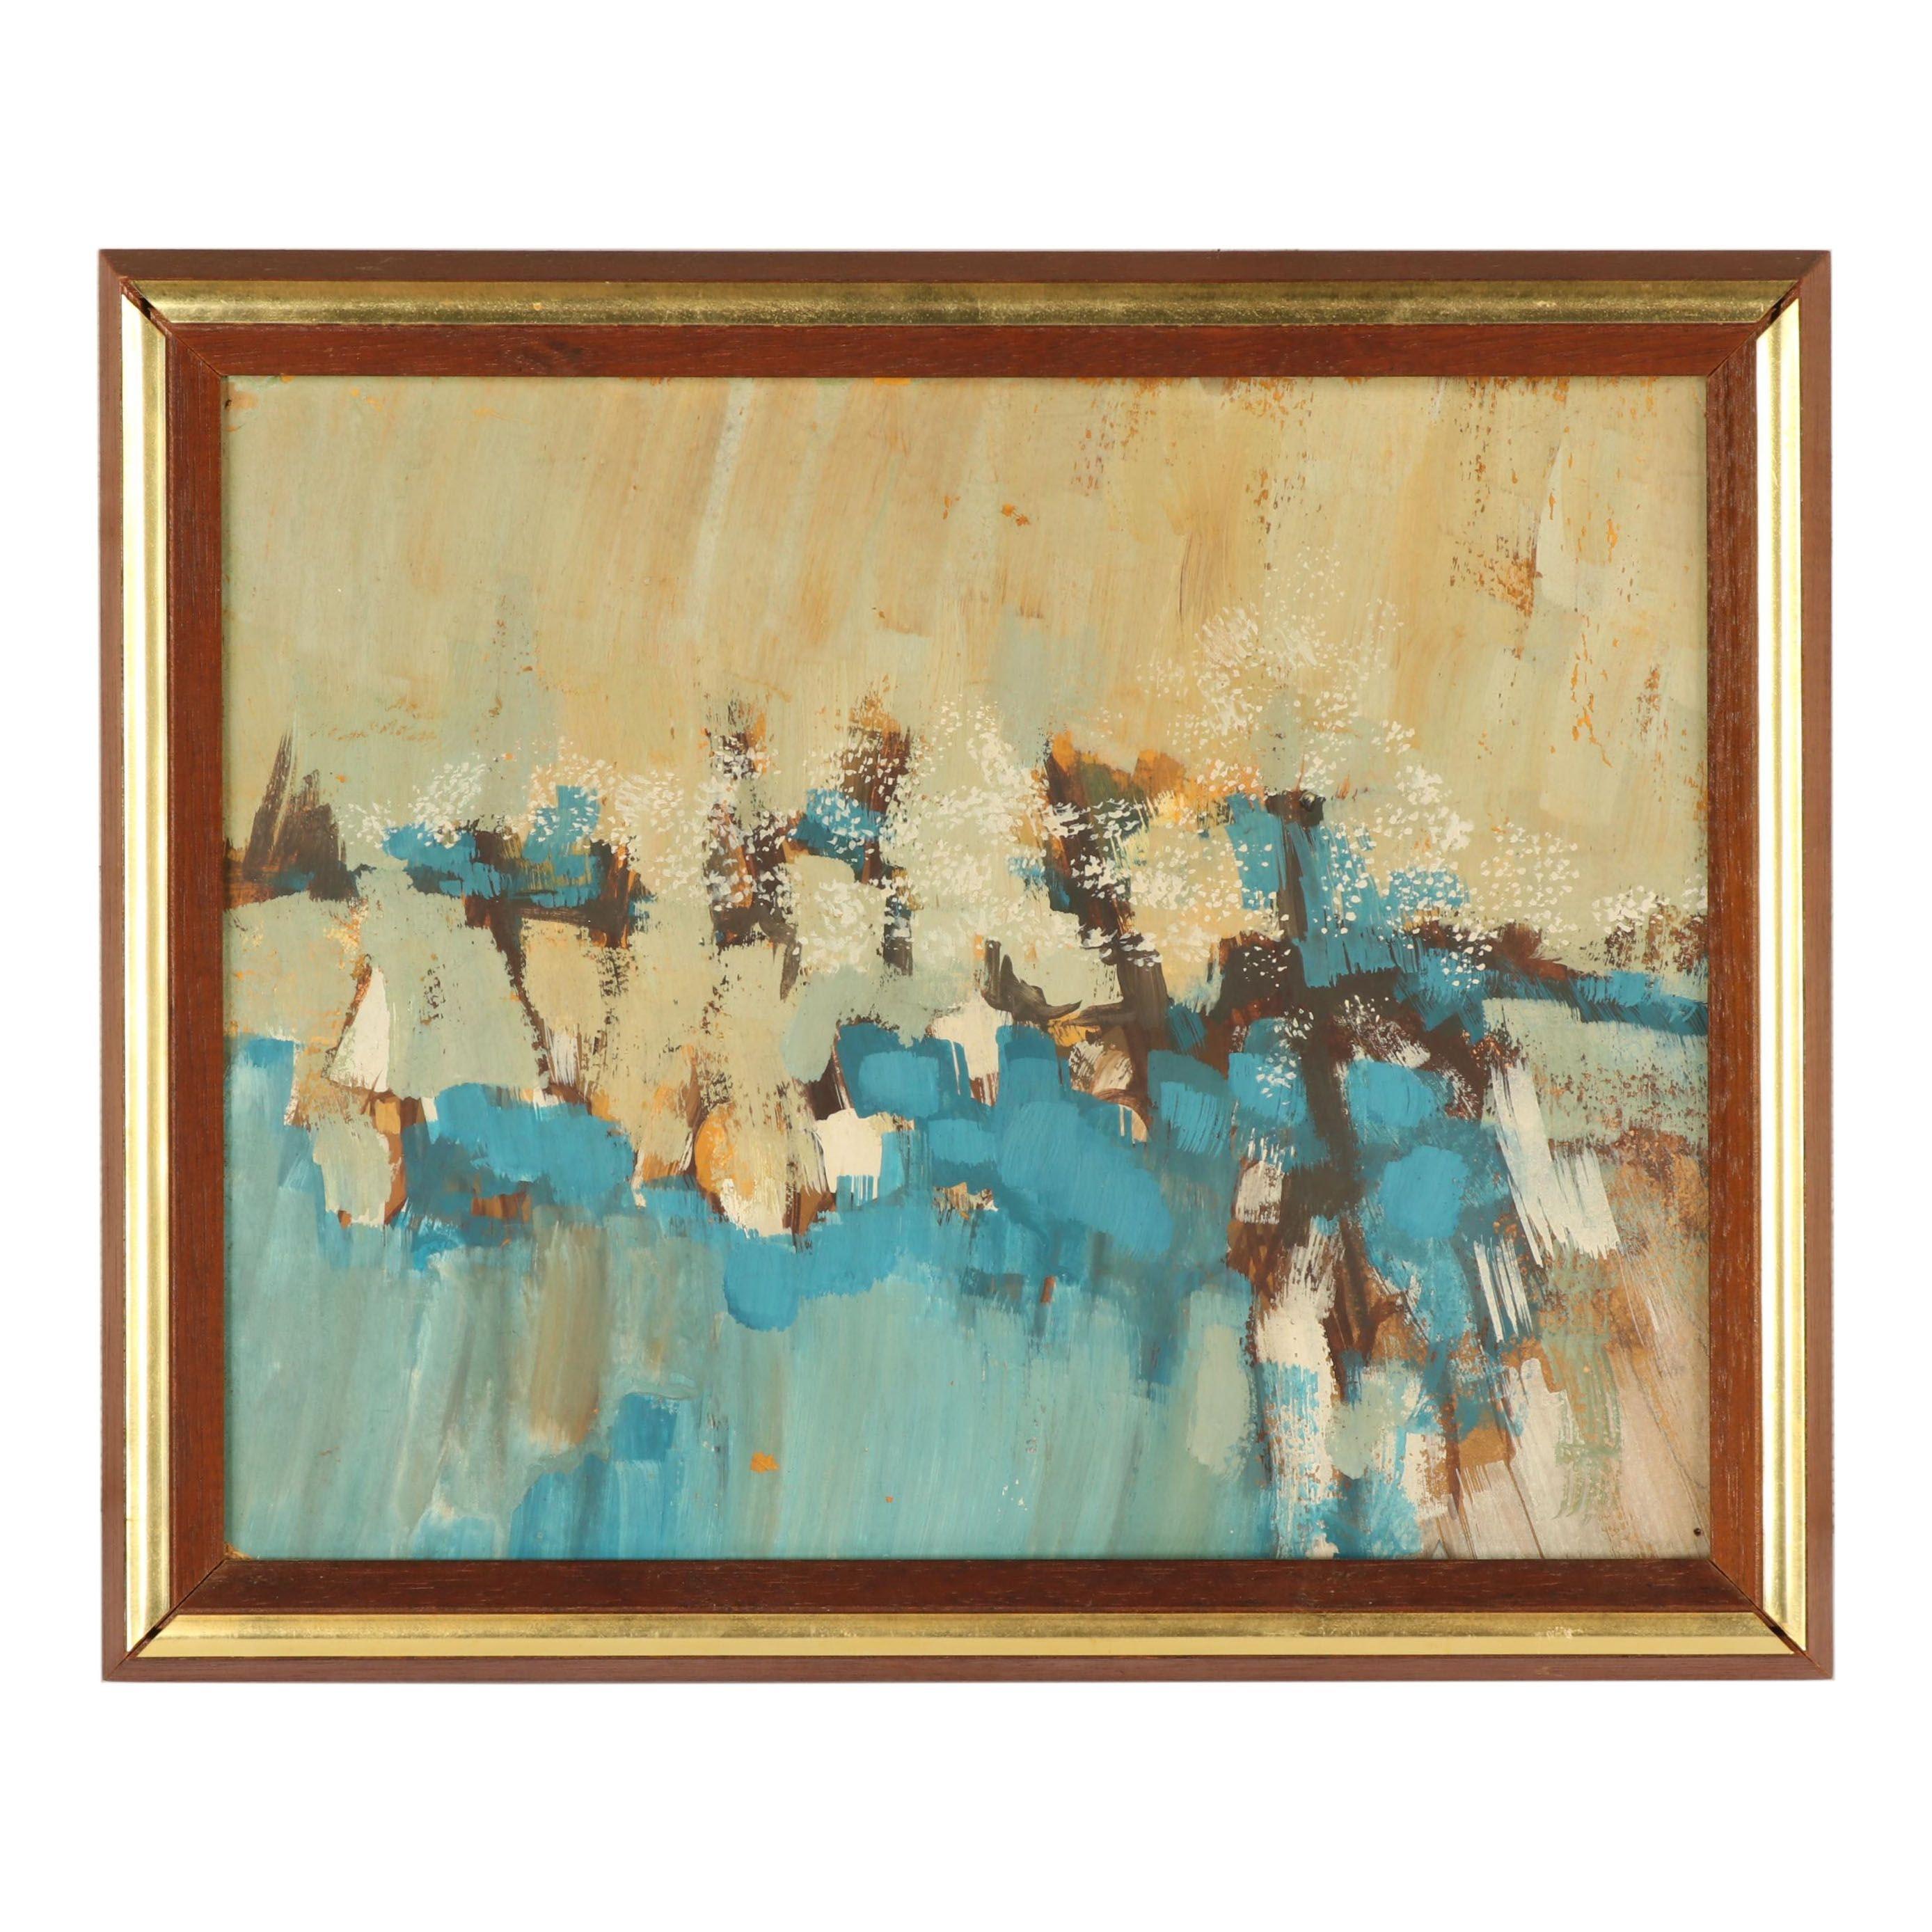 Letzkus Abstract Gouache Painting